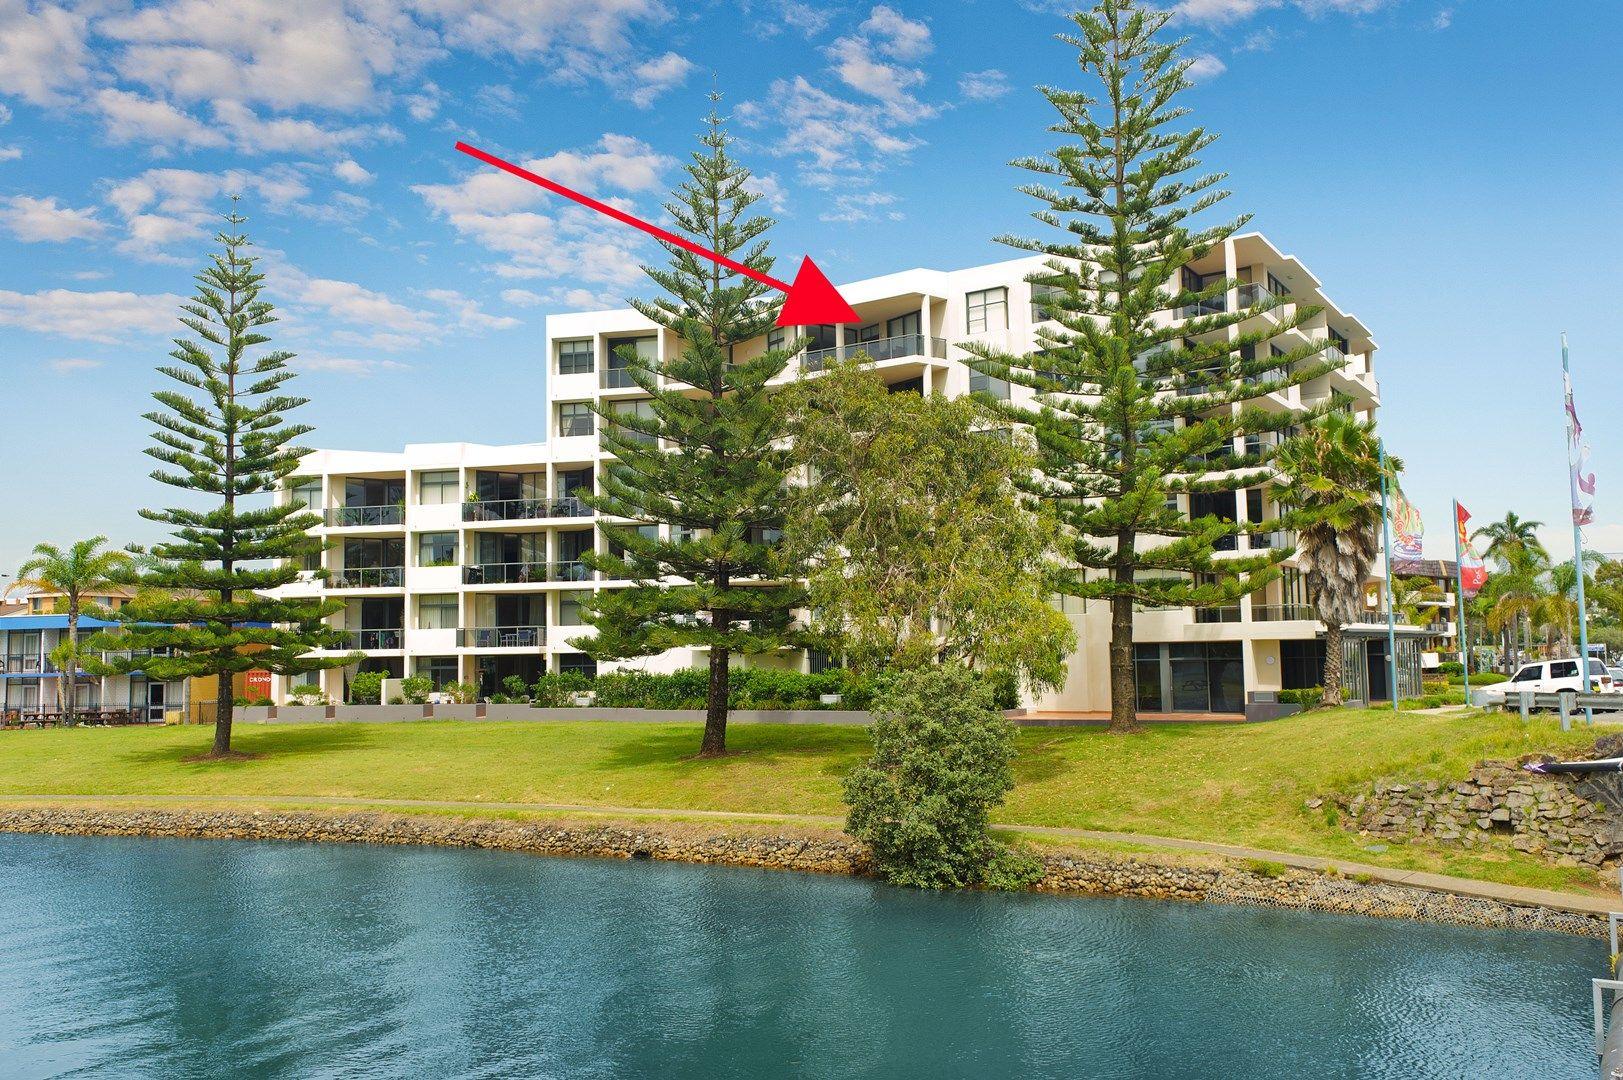 703/2 Hollingworth  Street, Port Macquarie NSW 2444, Image 0